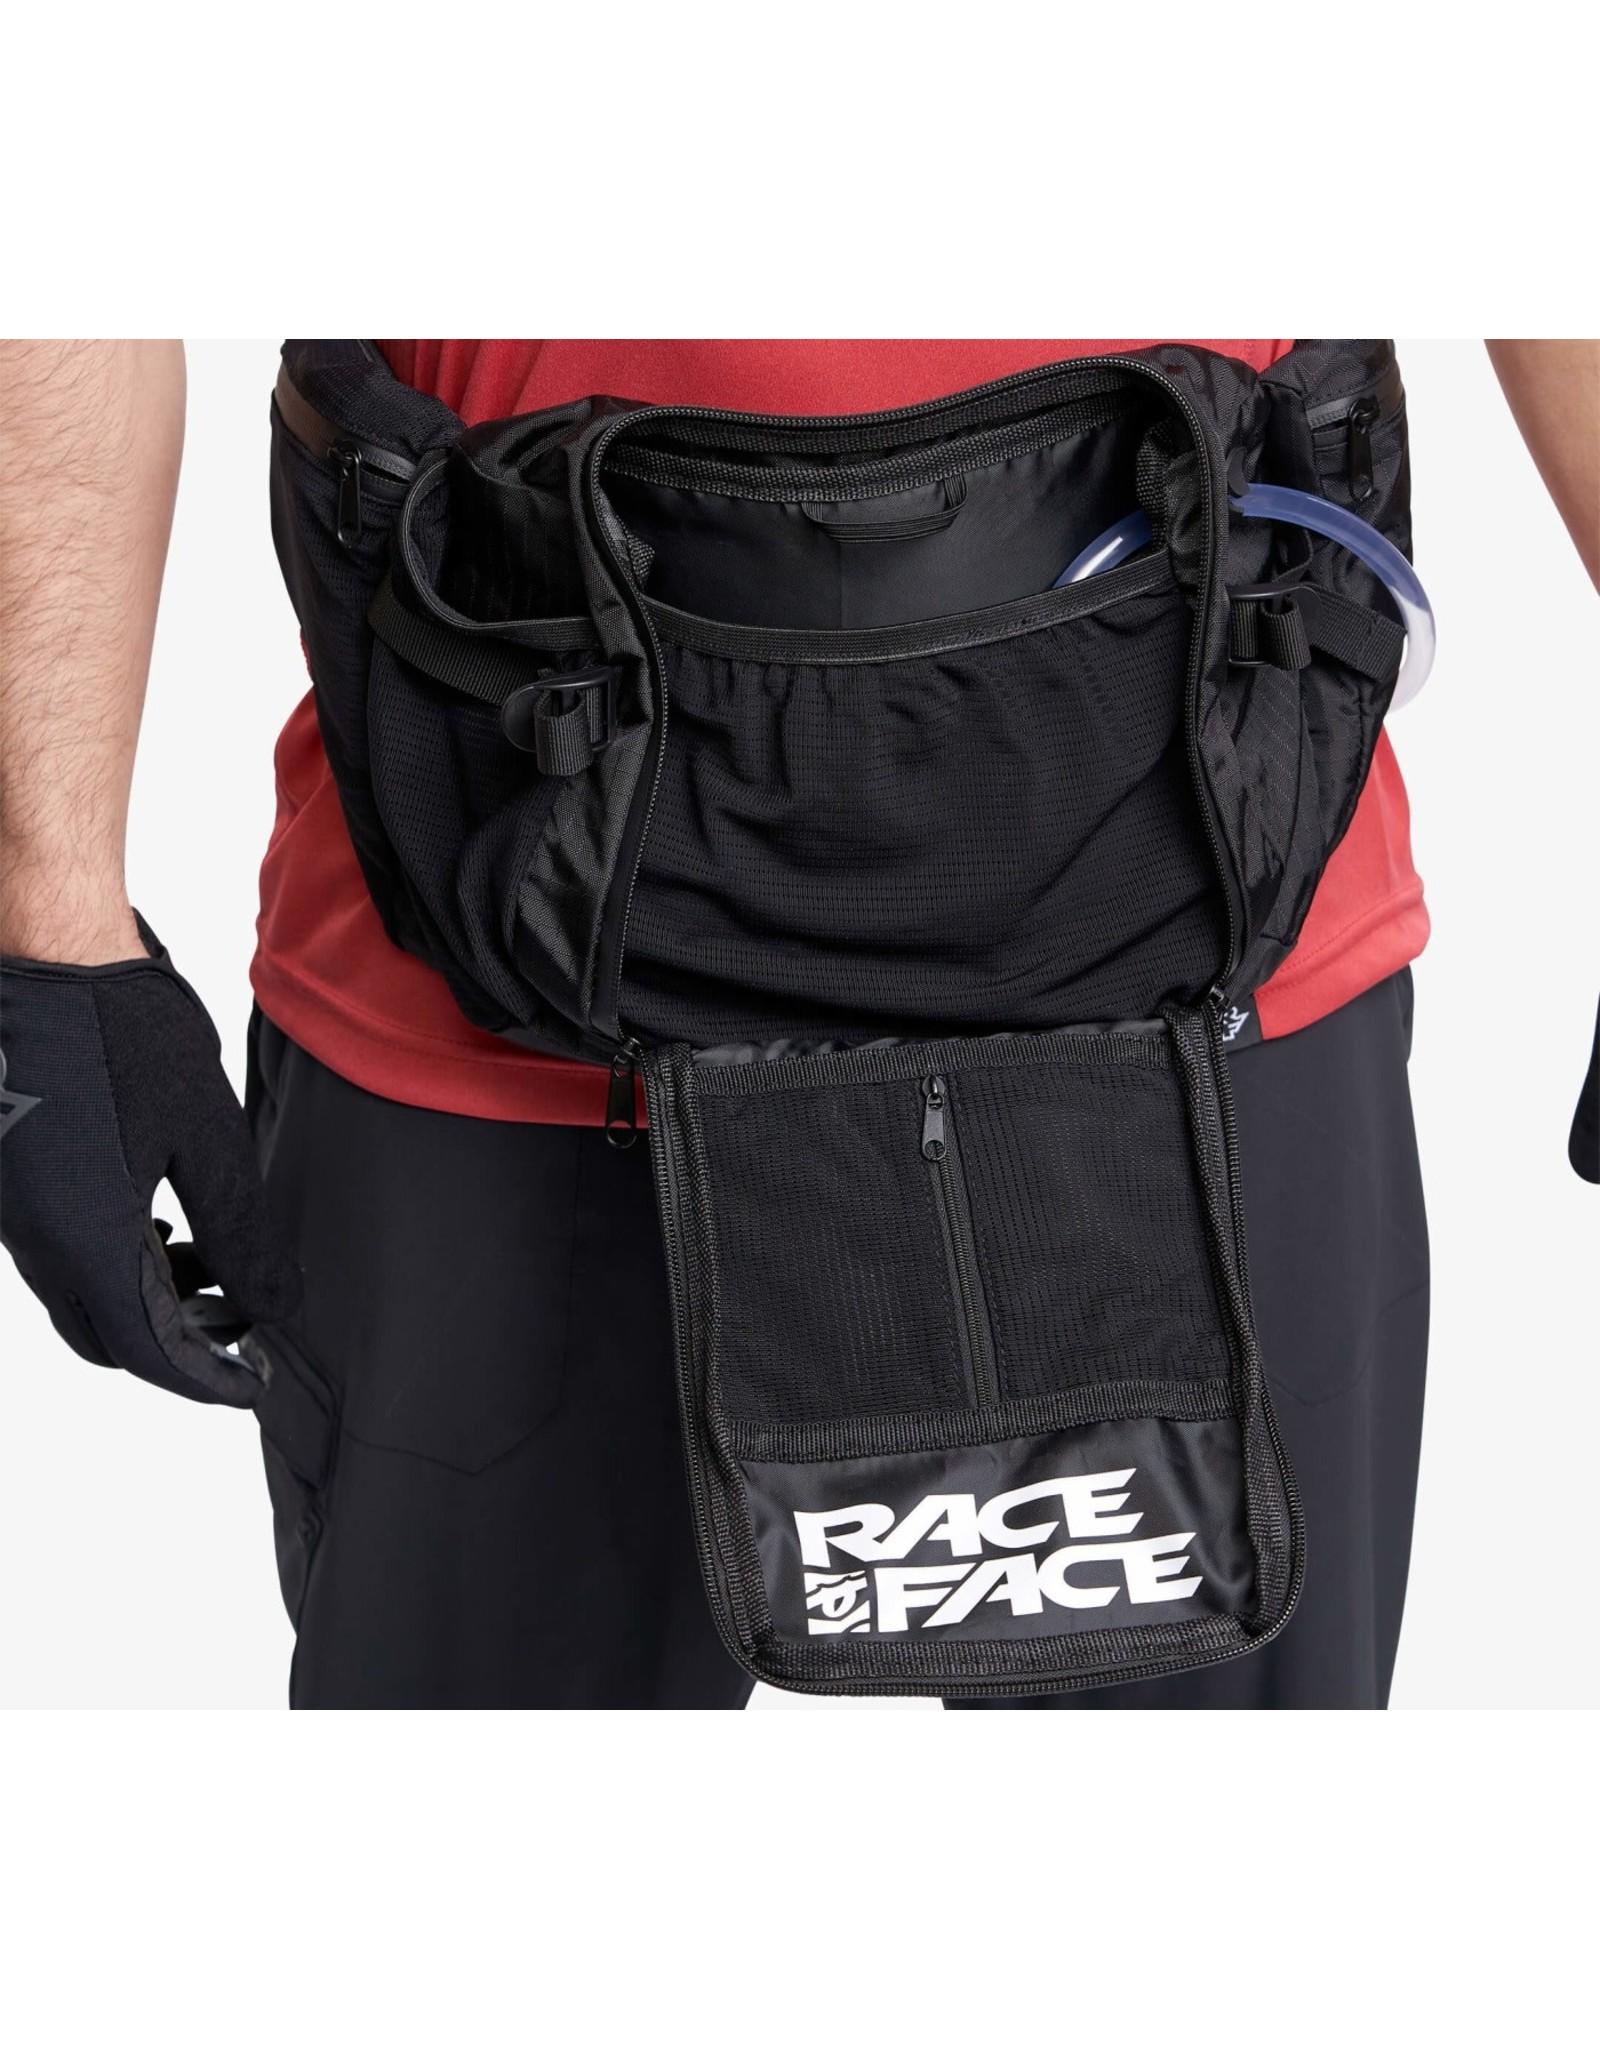 Race Face Raceface Stash 3L Hip Bag-Stealth-Onesize Stealth